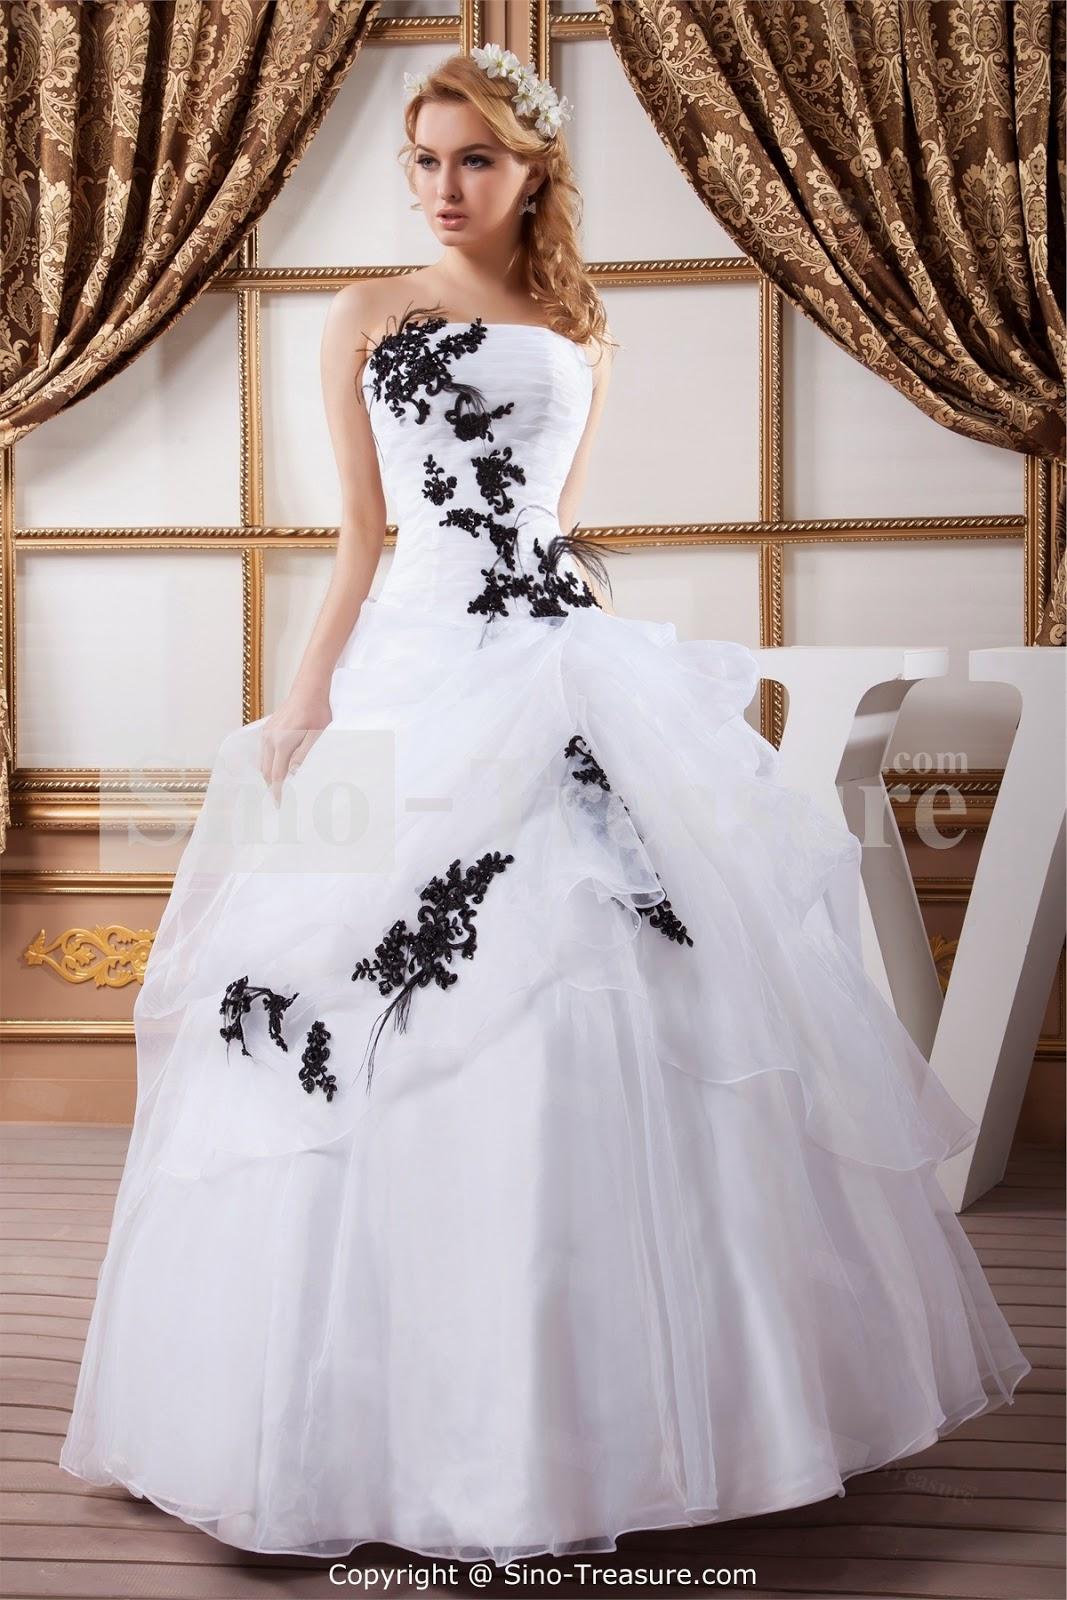 The History of the White Wedding Dress  Wedding Dresses